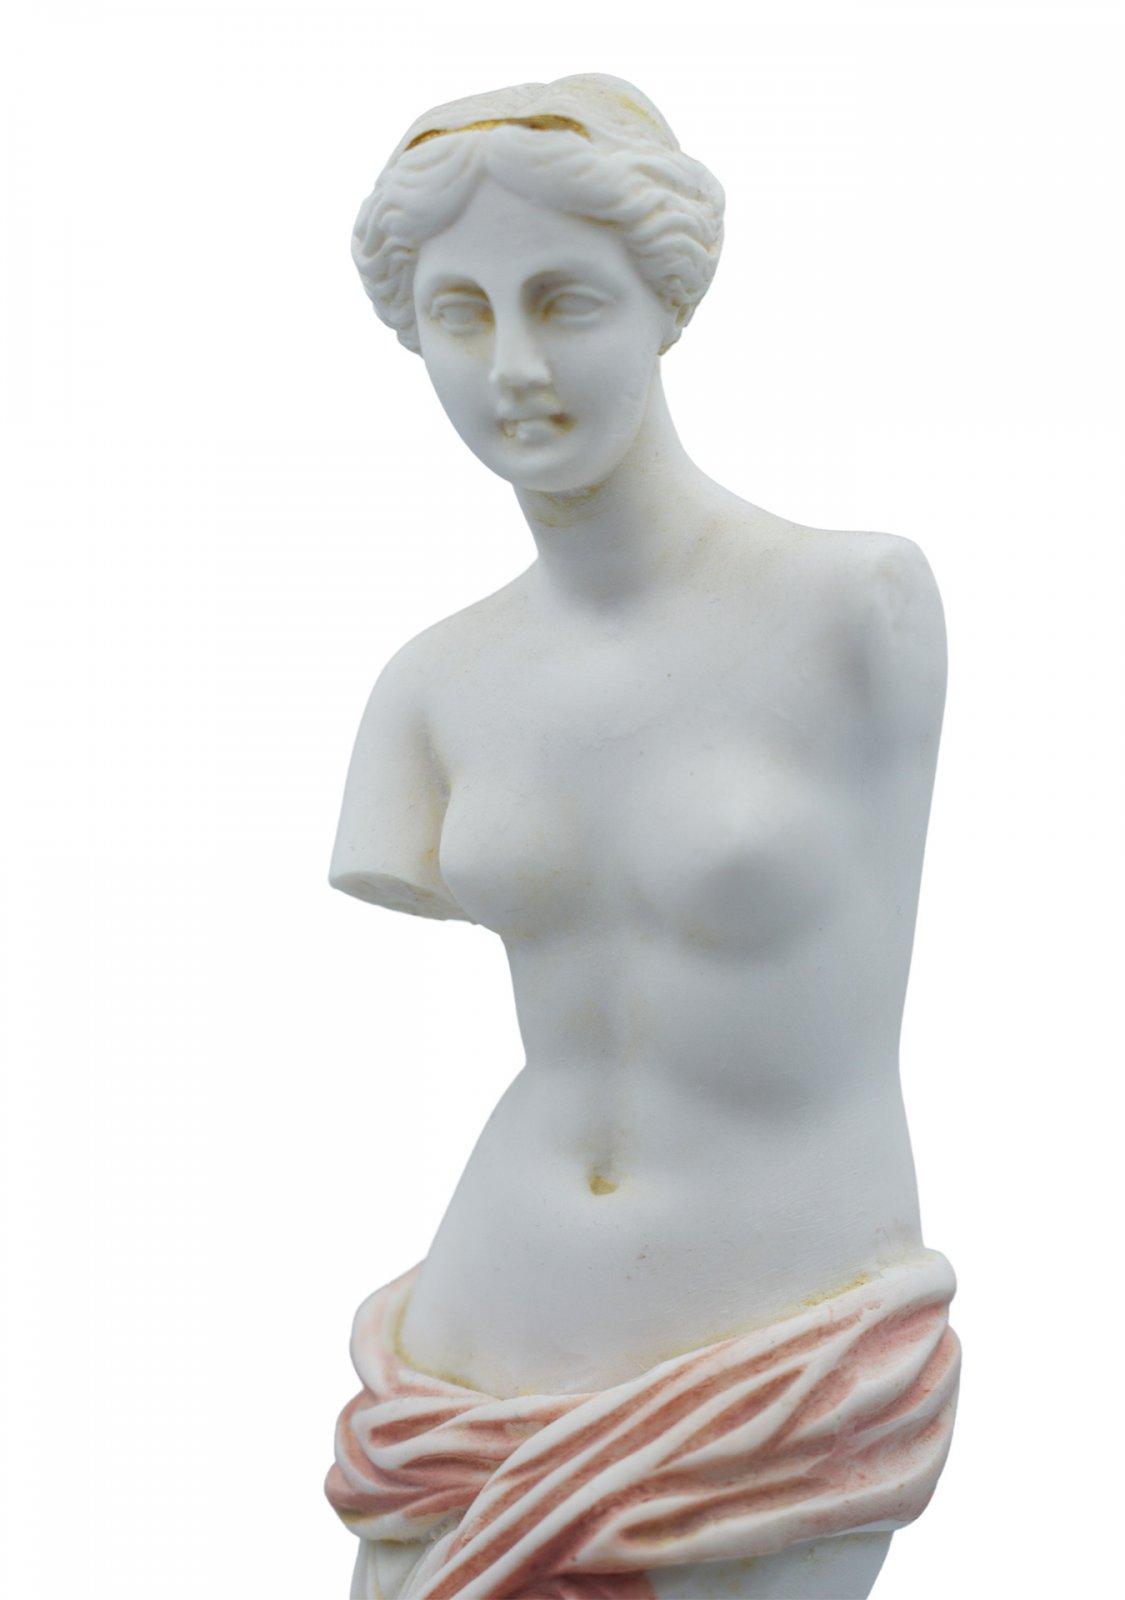 Aphrodite of Milos (Venus de Milo) greek alabaster statue with pink color and golden details